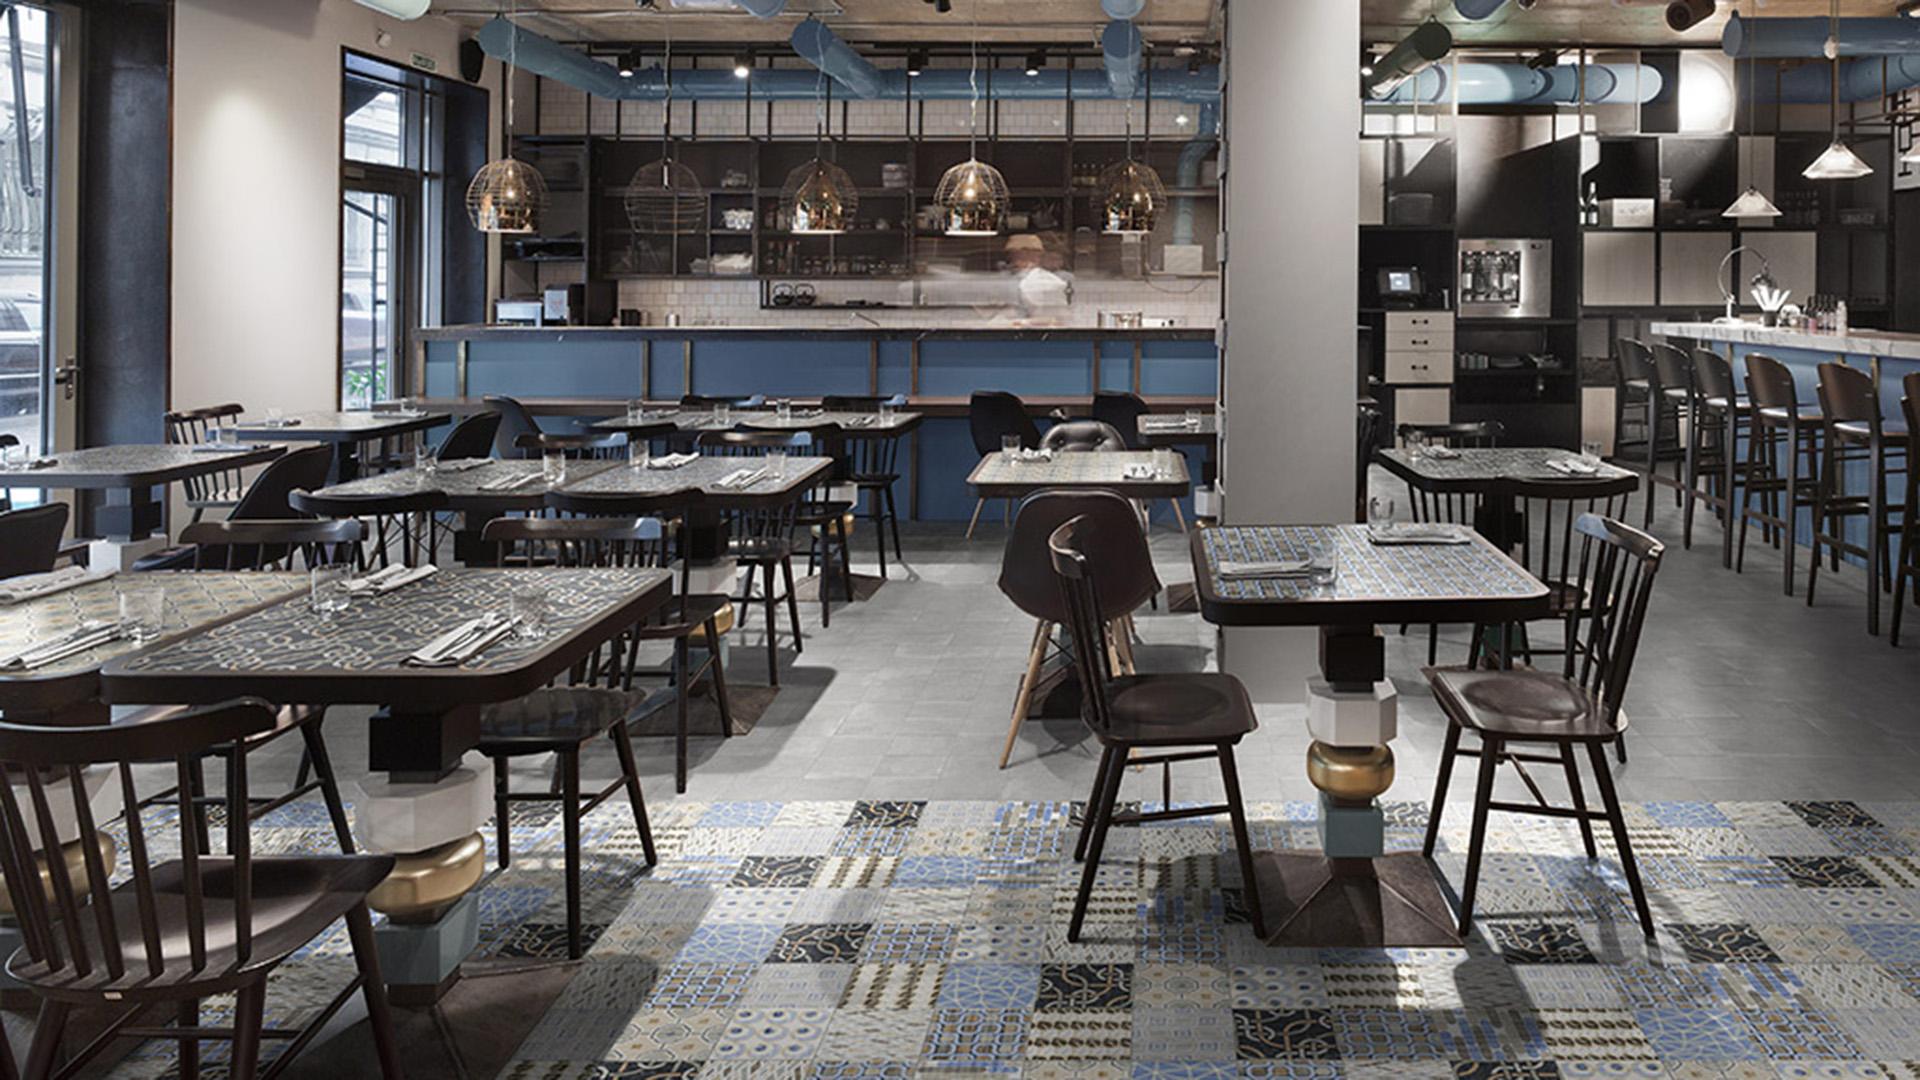 Pavimento-in-gres_Ceramica-Fioranese_Cementine_Evo-Mix_Evoke-Grey-20x20